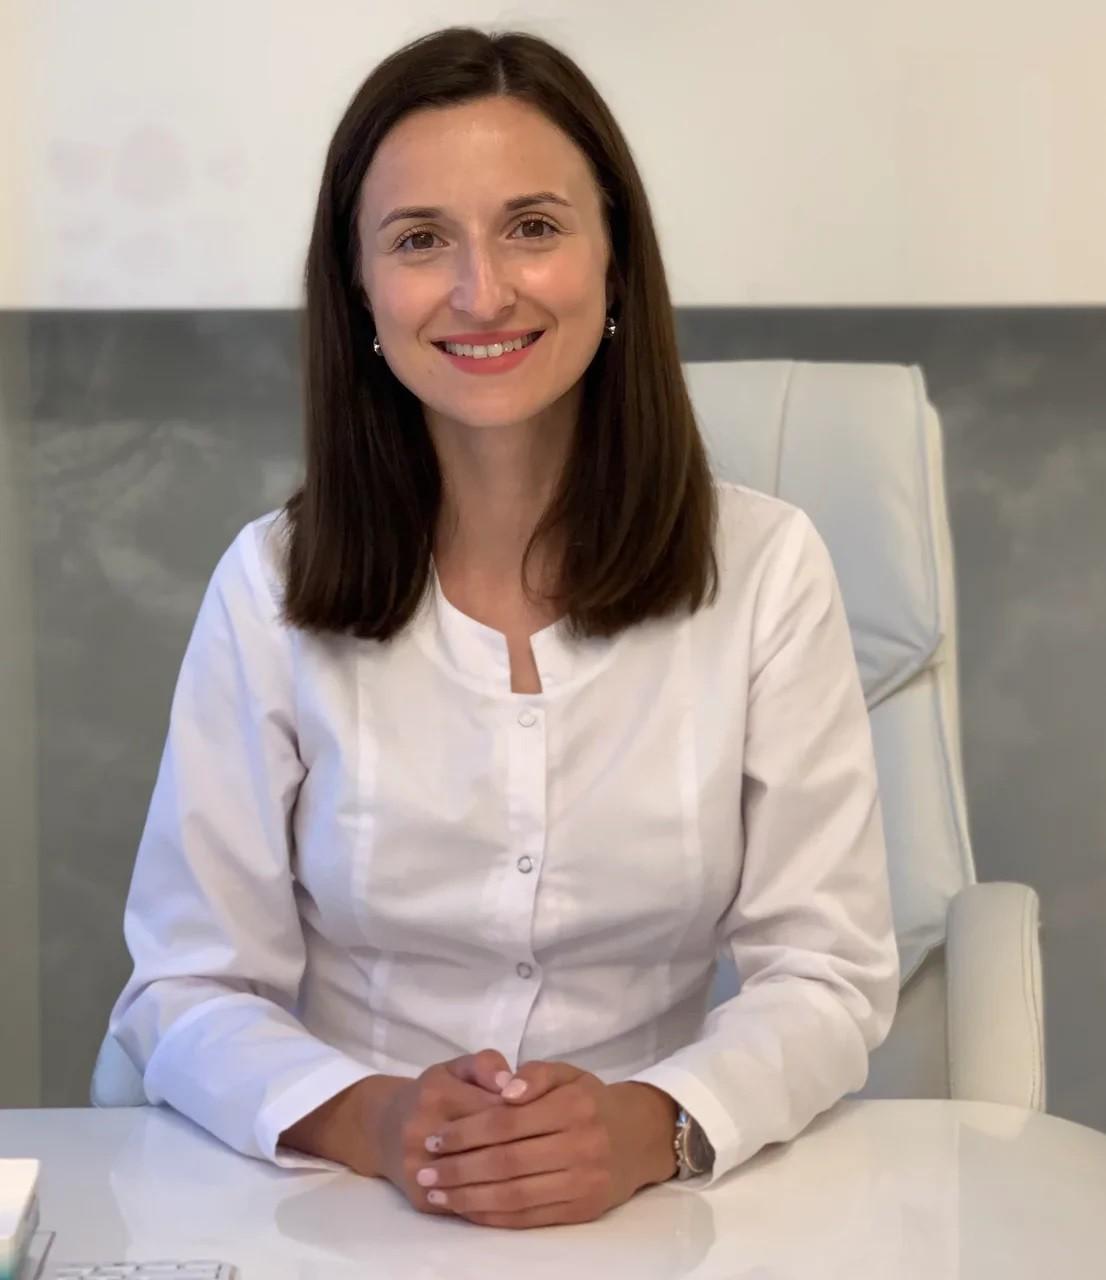 Звягинцева Наталья Васильевна